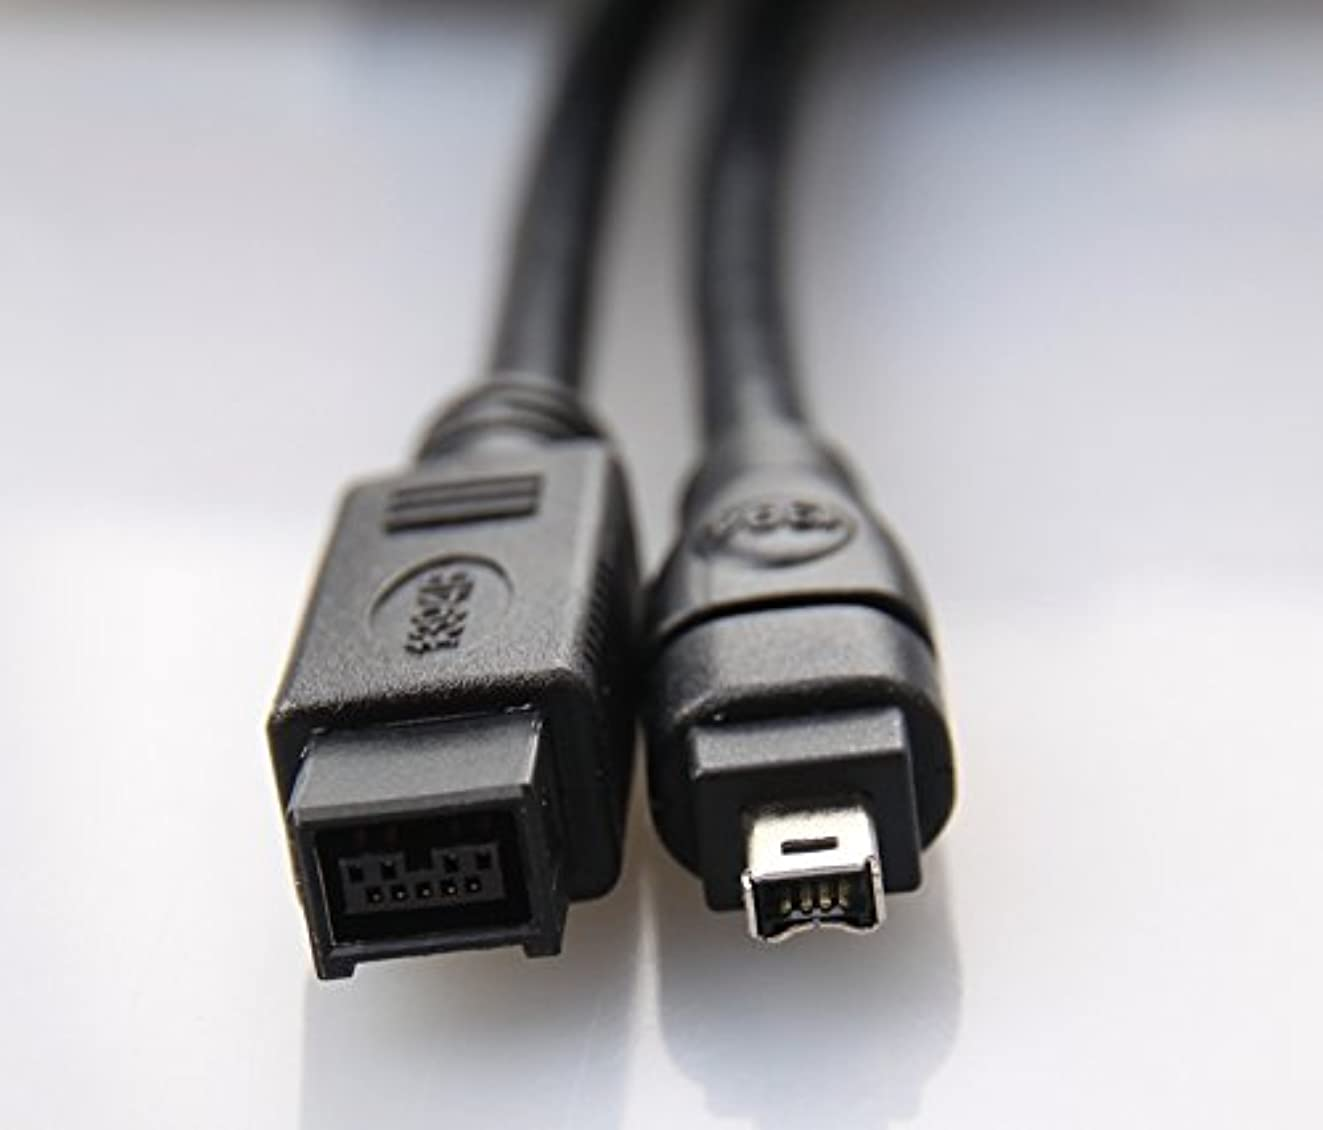 Bizlander Firewire High Speed Premium DV to Firewire Cable 800 1394B 800-400 IEEE 9 Pin Male to 4 Pin Male Cable 6FT for Mac Pro, MacBook Pro, Mac Mini, iMac PC,Digital Cameras, SLR